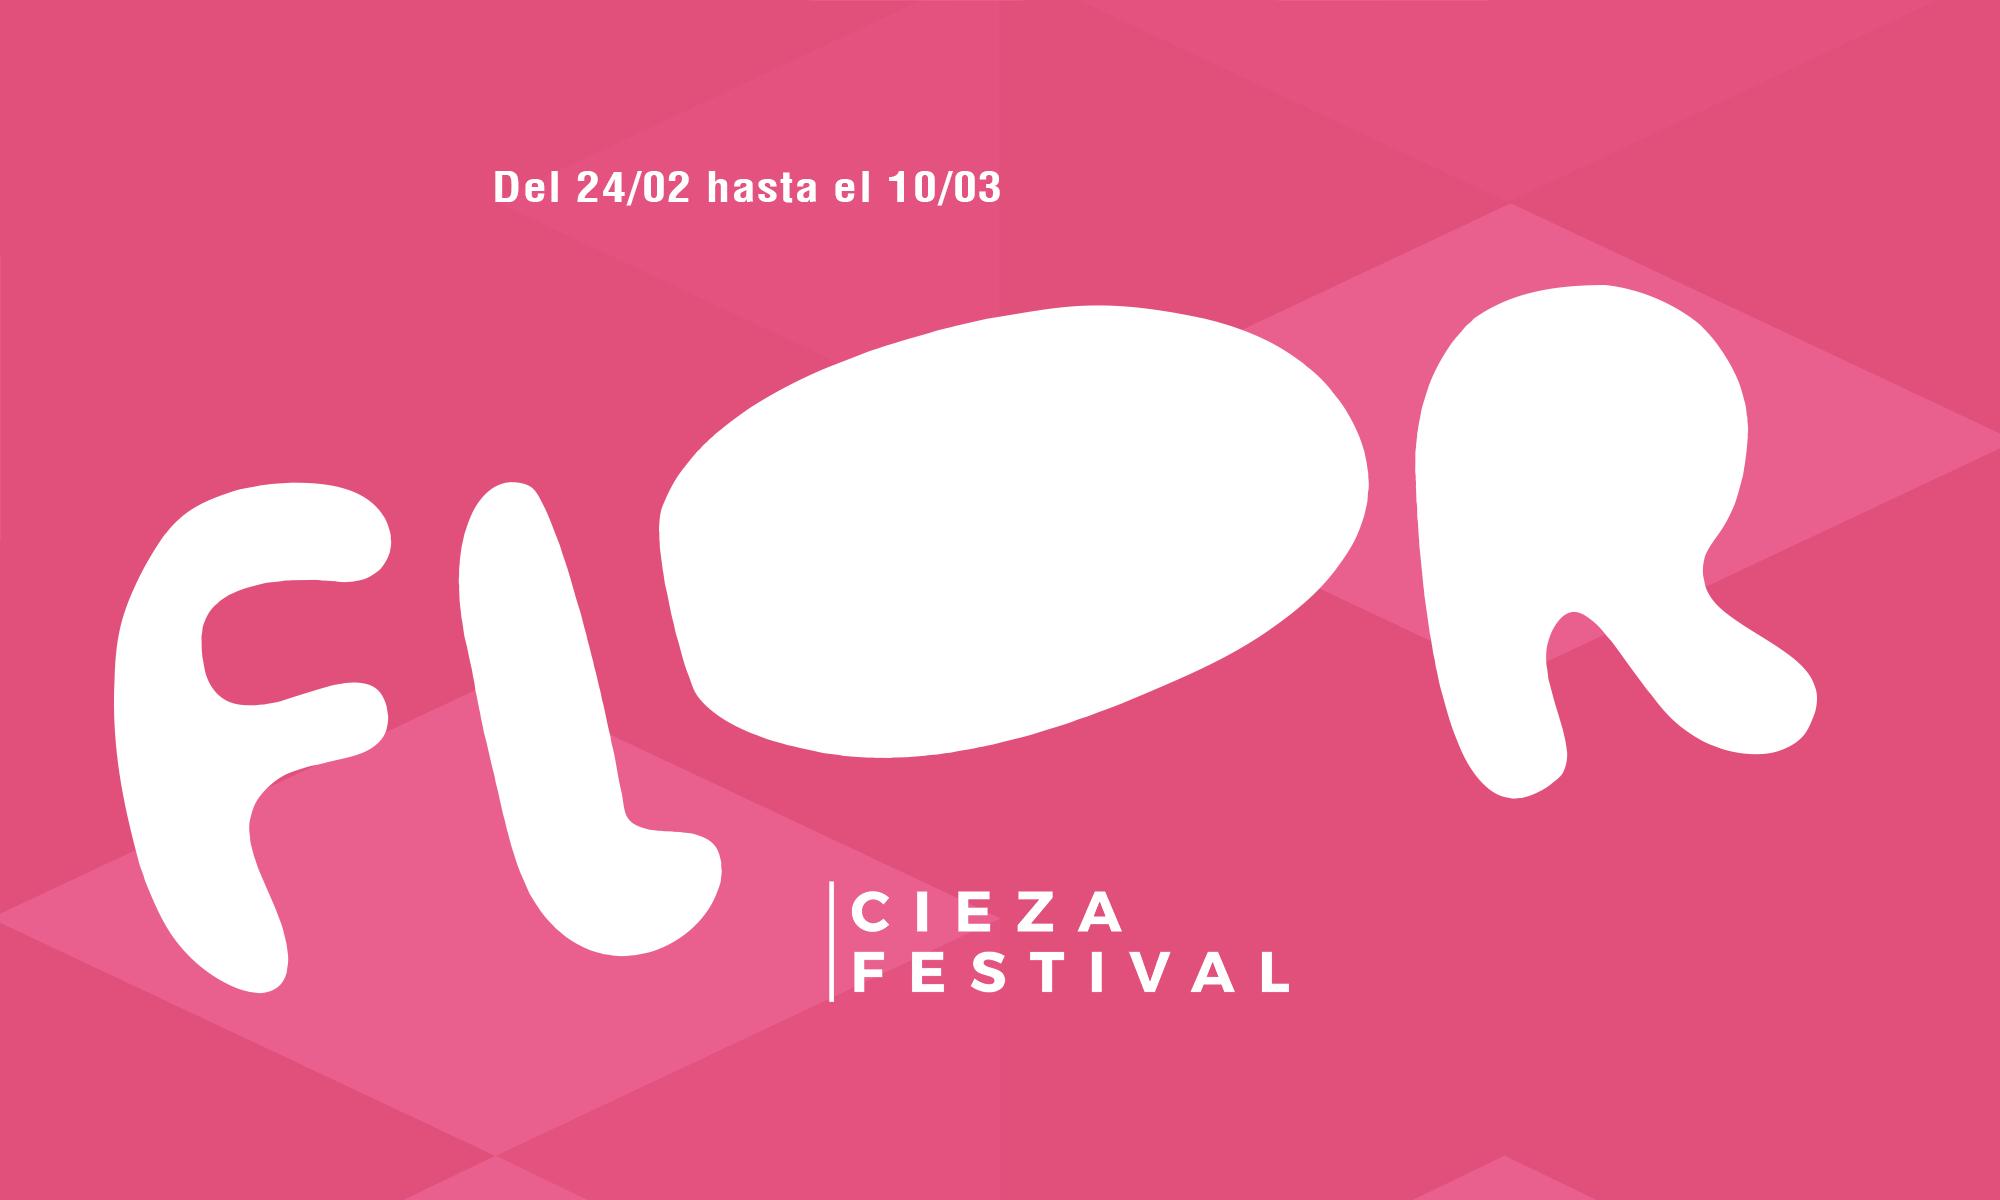 Flor Cieza Festival